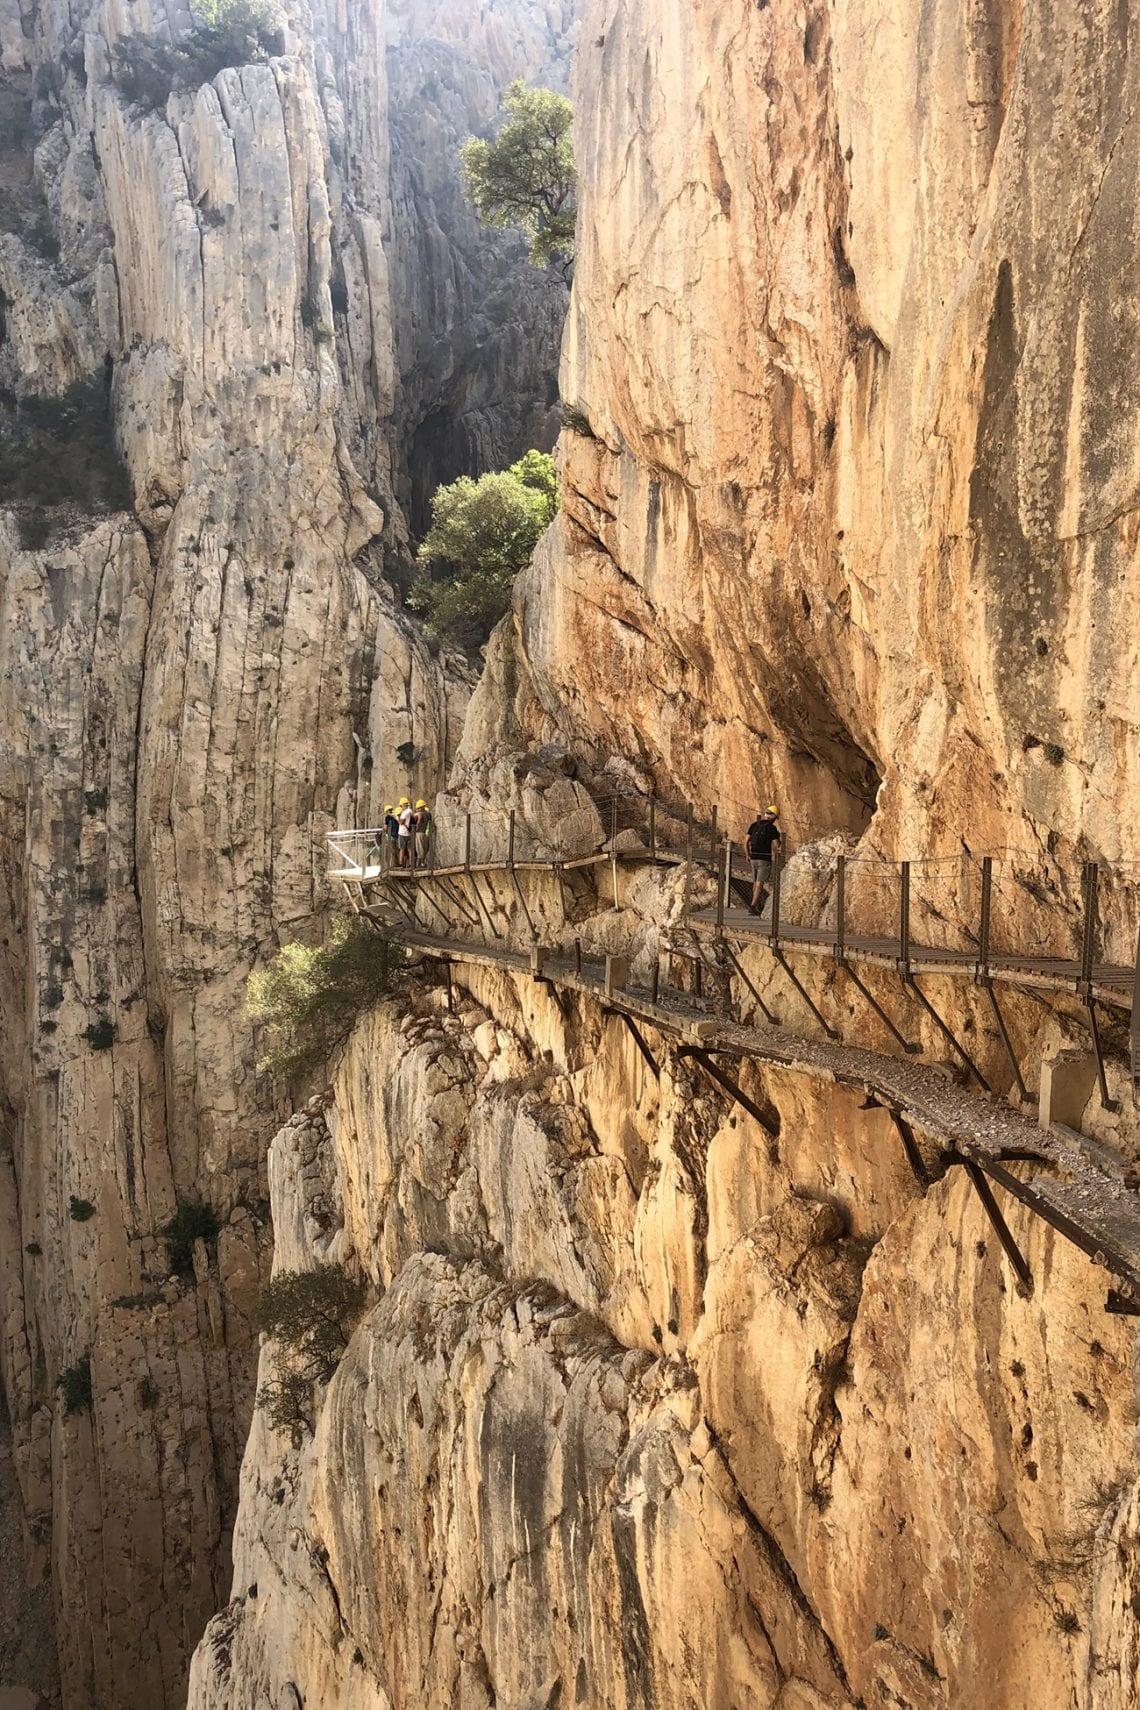 caminito del rey paths running along the cliffs